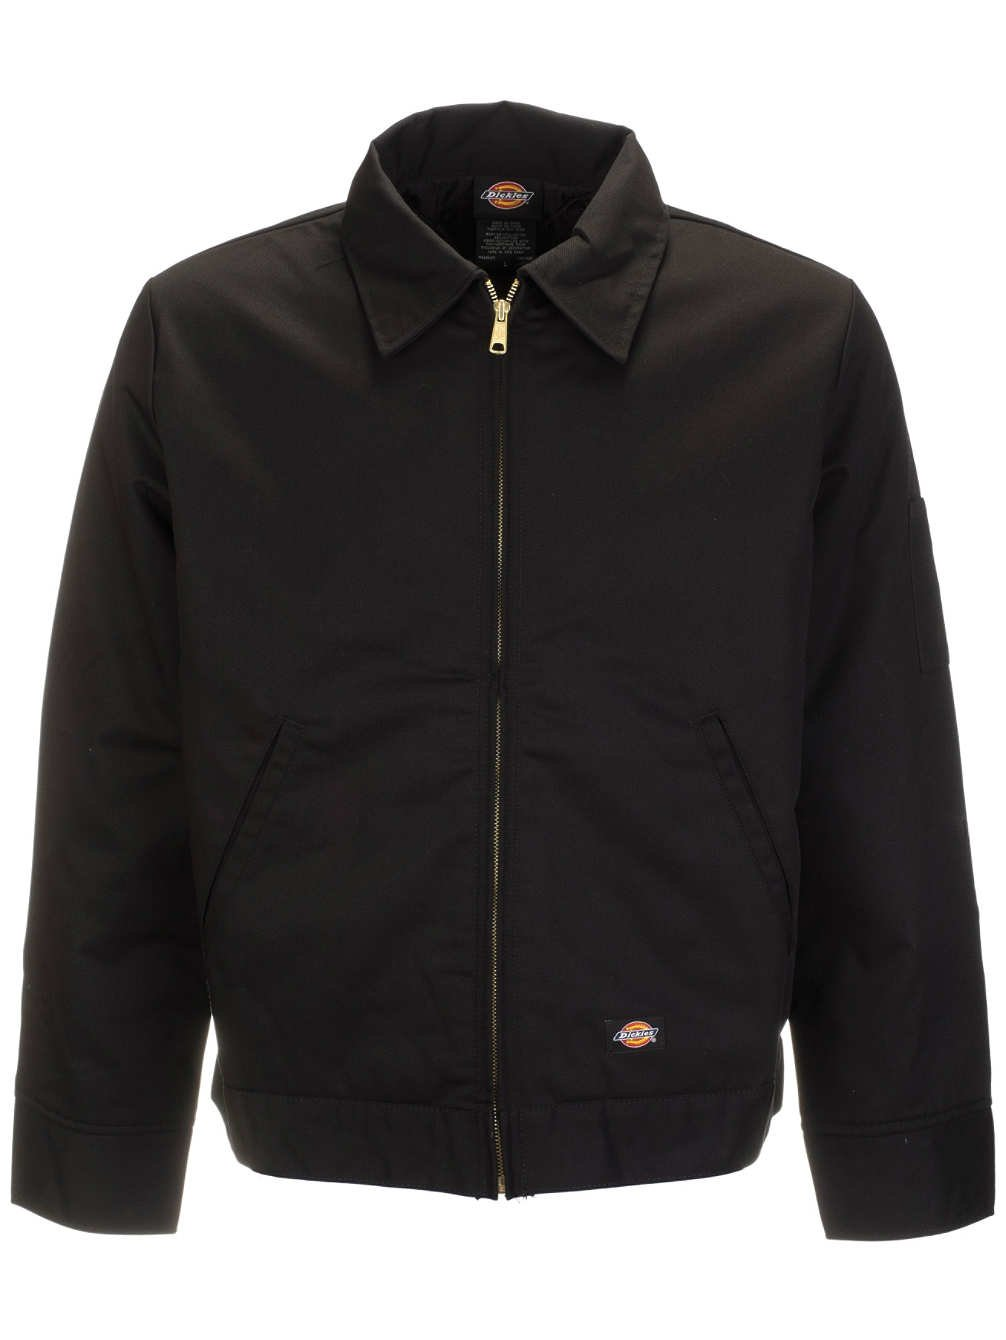 Dickies TJ15BK-2X-RG Insulated Eisenhower Jacket 2X-Large Black